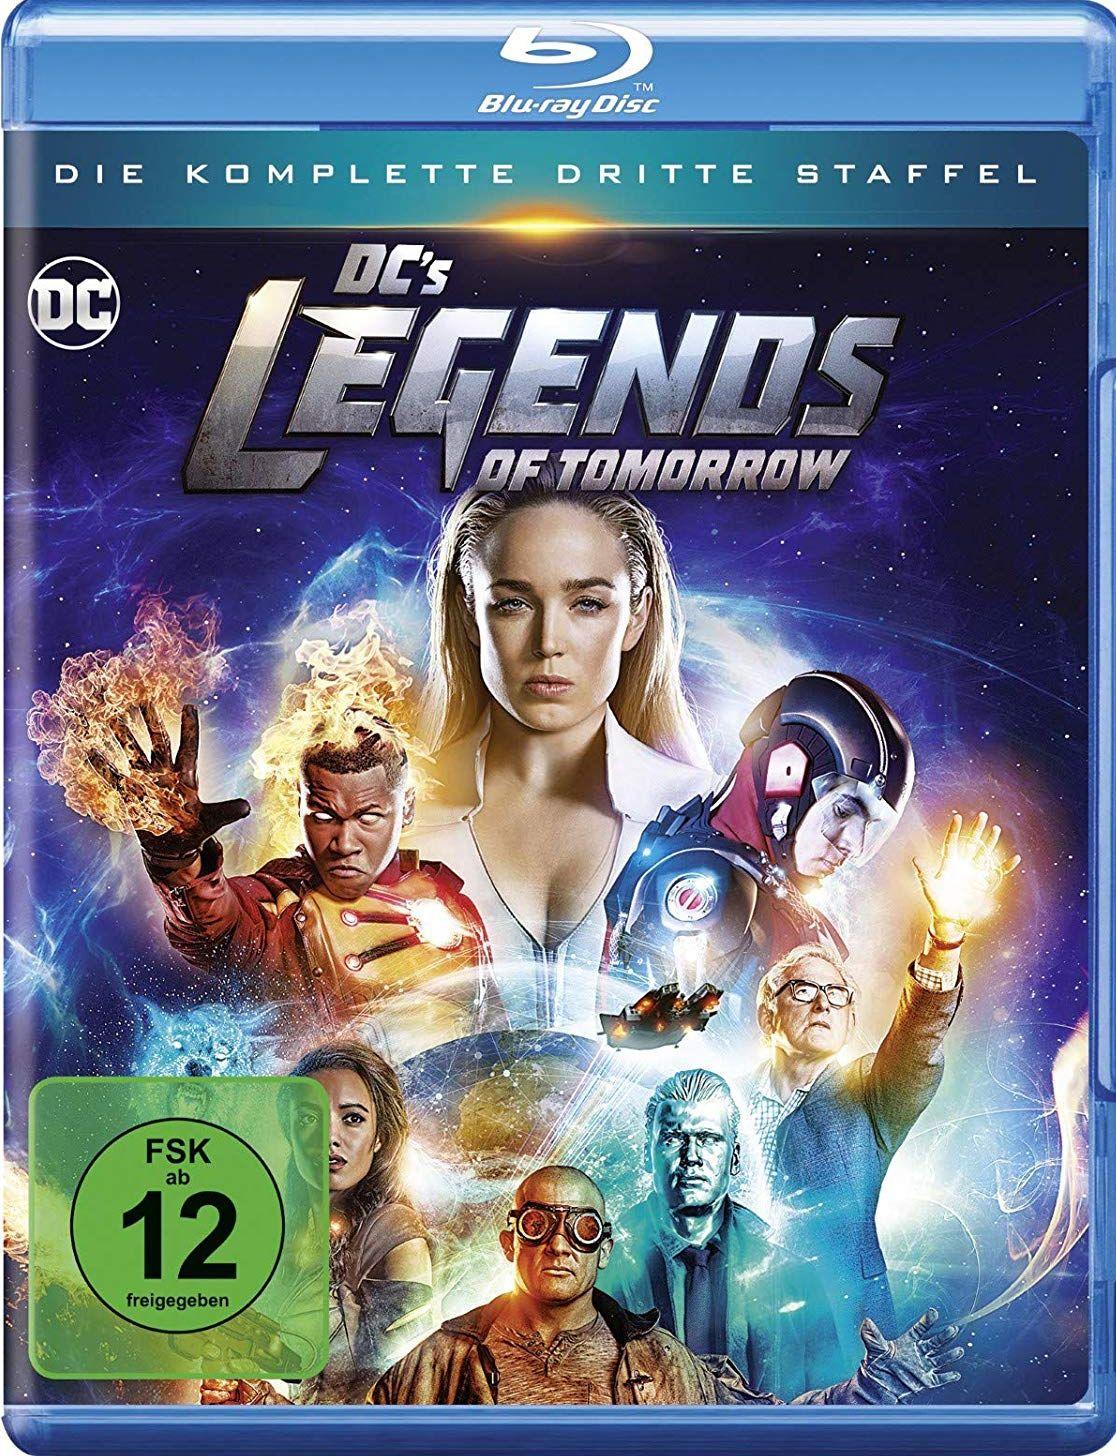 DC's Legends of Tomorrow - Staffel 3 (3 Discs) (BLURAY)